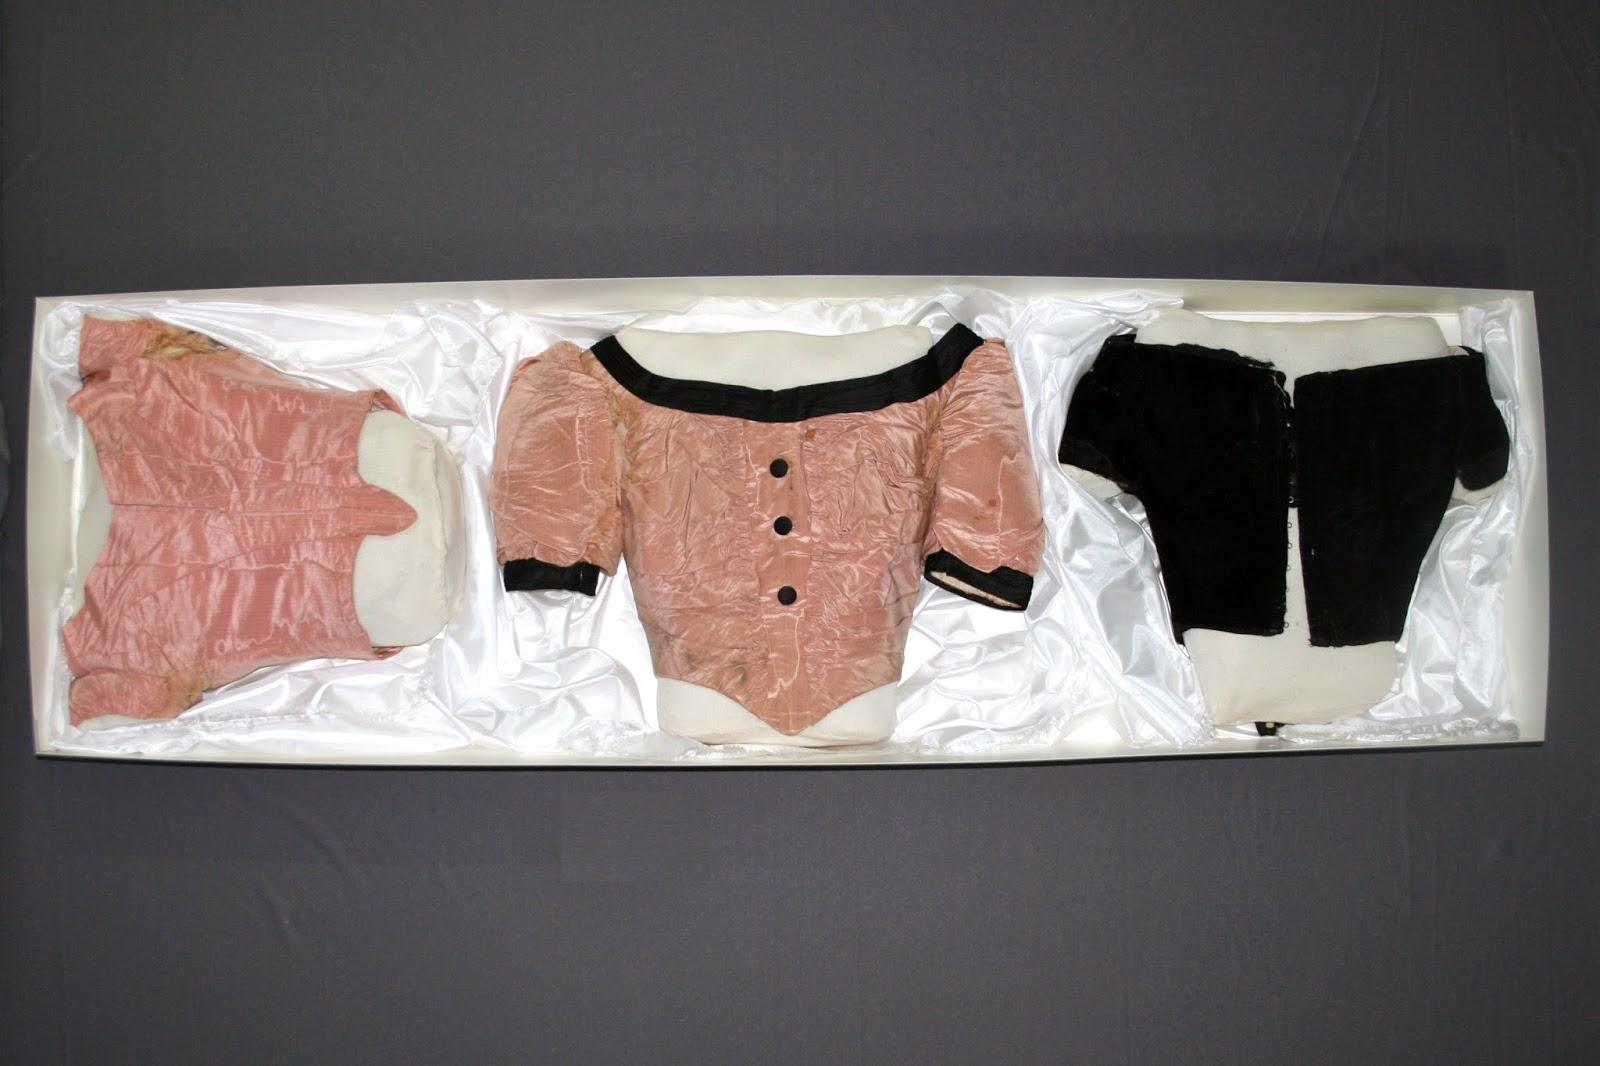 Spicer Art Conservation, Van Buren dresses, textile conservator, historic garments, 1840s